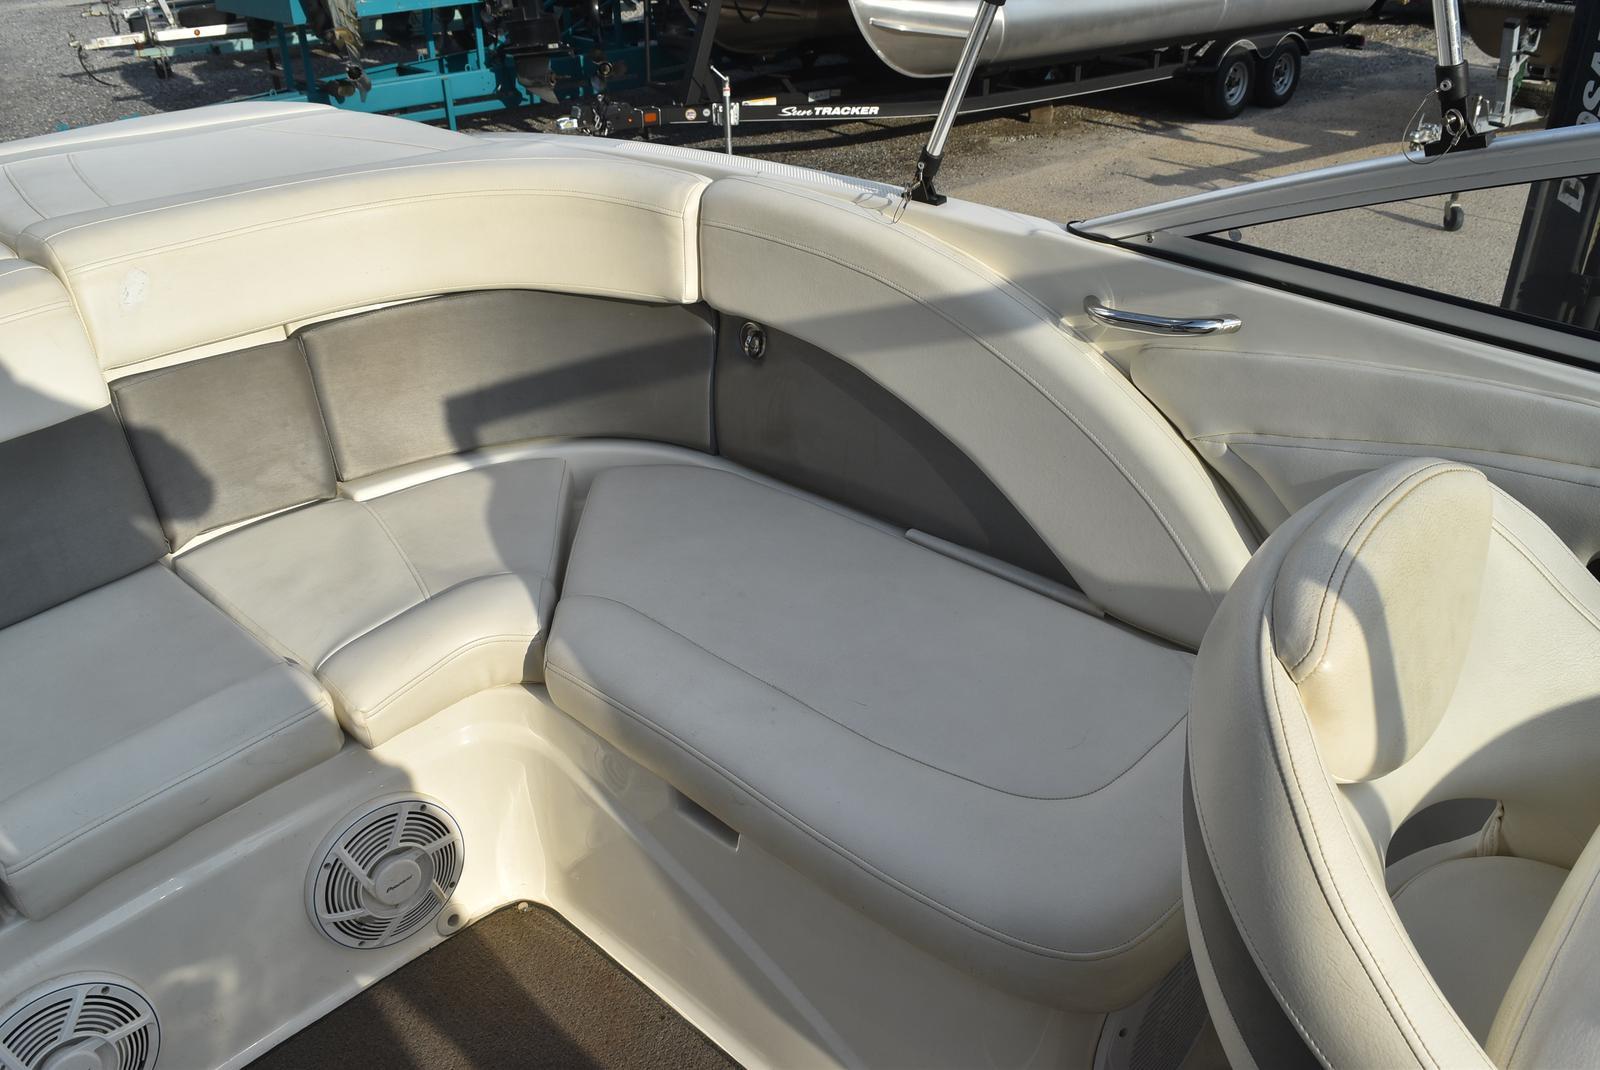 2010 Bayliner boat for sale, model of the boat is 235BR & Image # 24 of 43